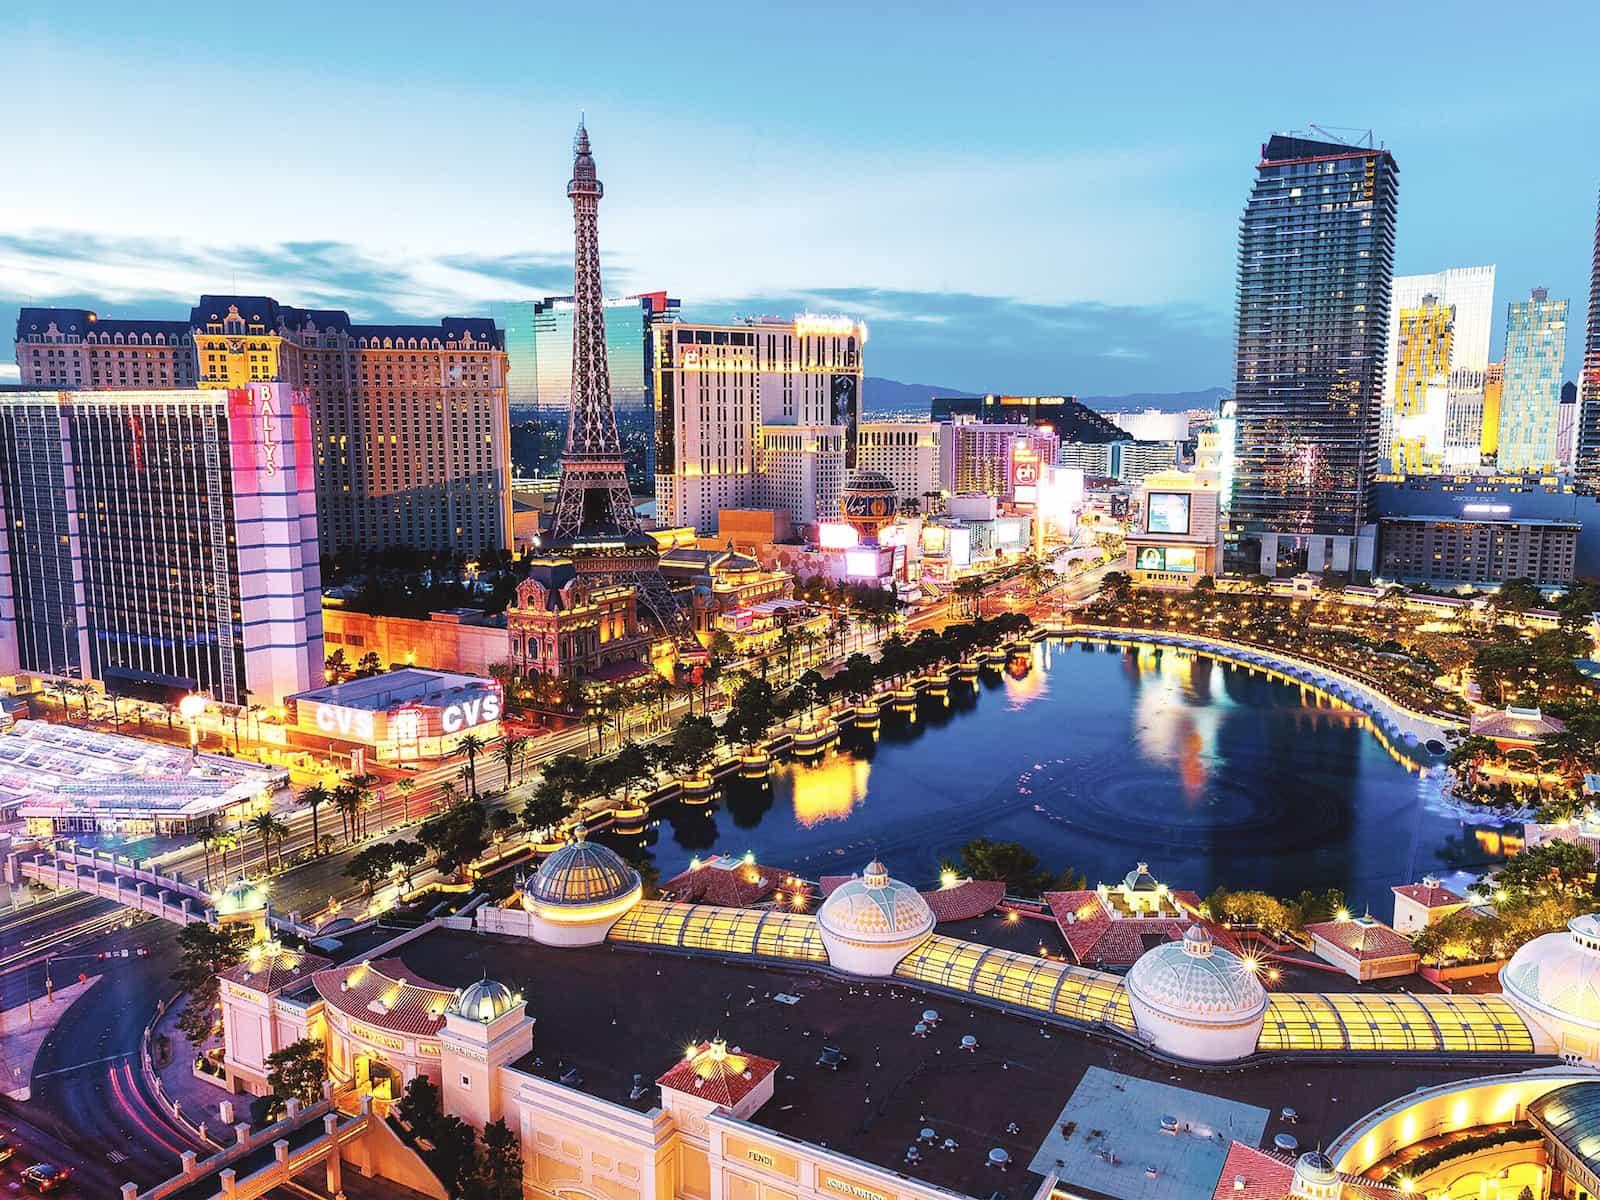 You can do more than pray for Las Vegas